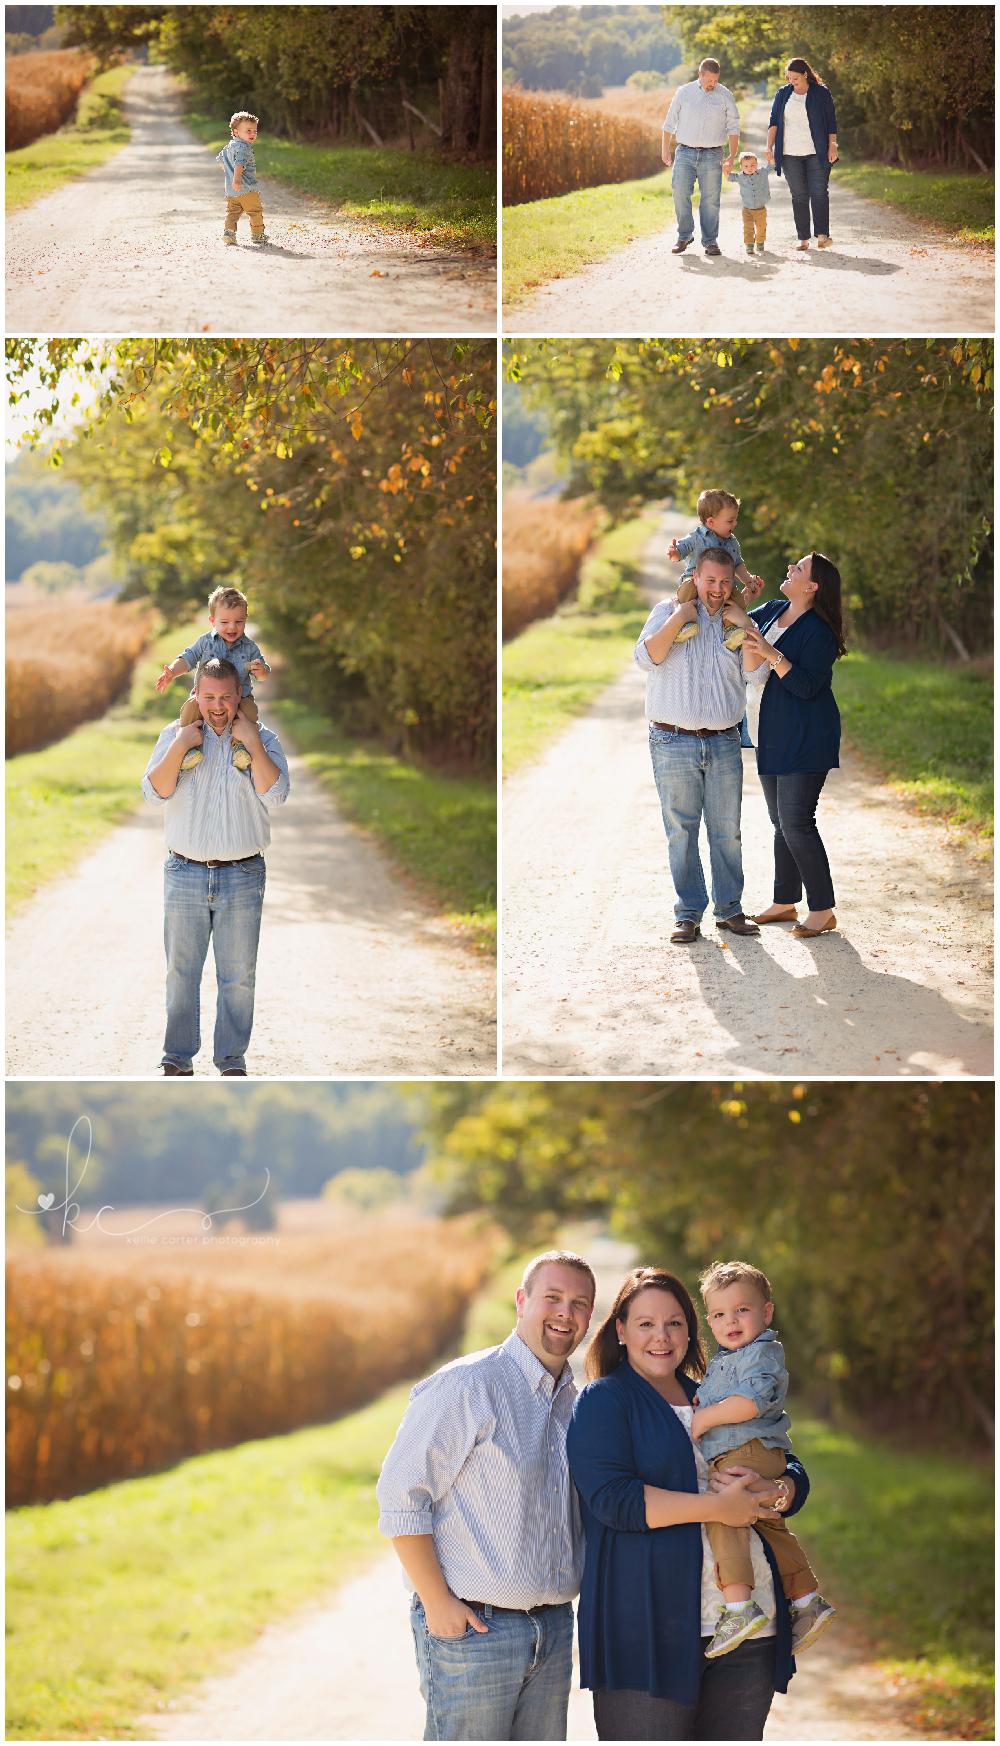 Kellie Carter Photography21 Prather Family Fall Mini Session {Portrait Photographer | Somerset, KY}